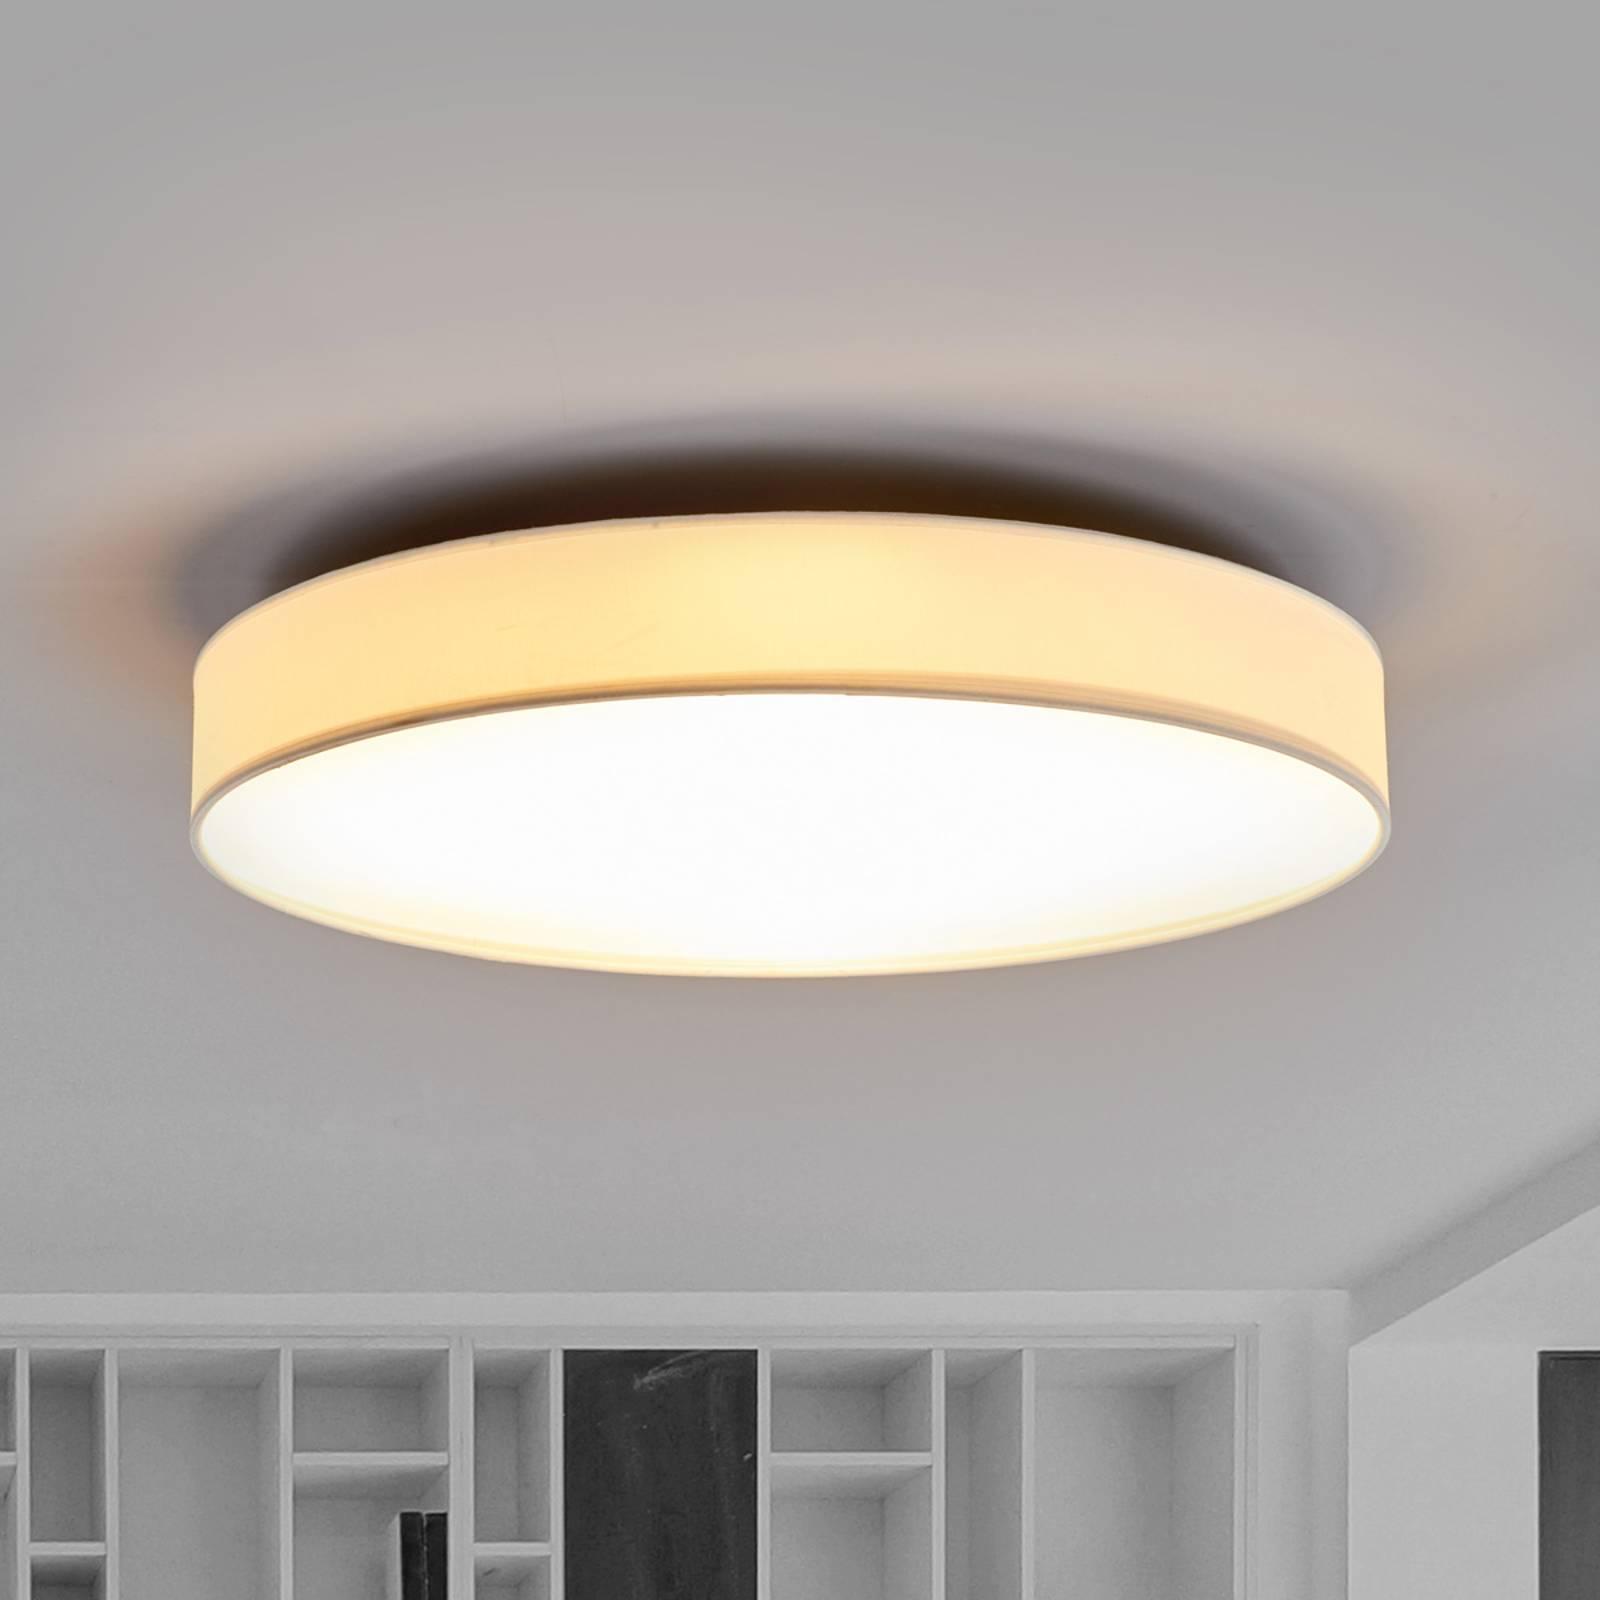 Lampa sufitowa LED z materiału Saira, 50 cm biała